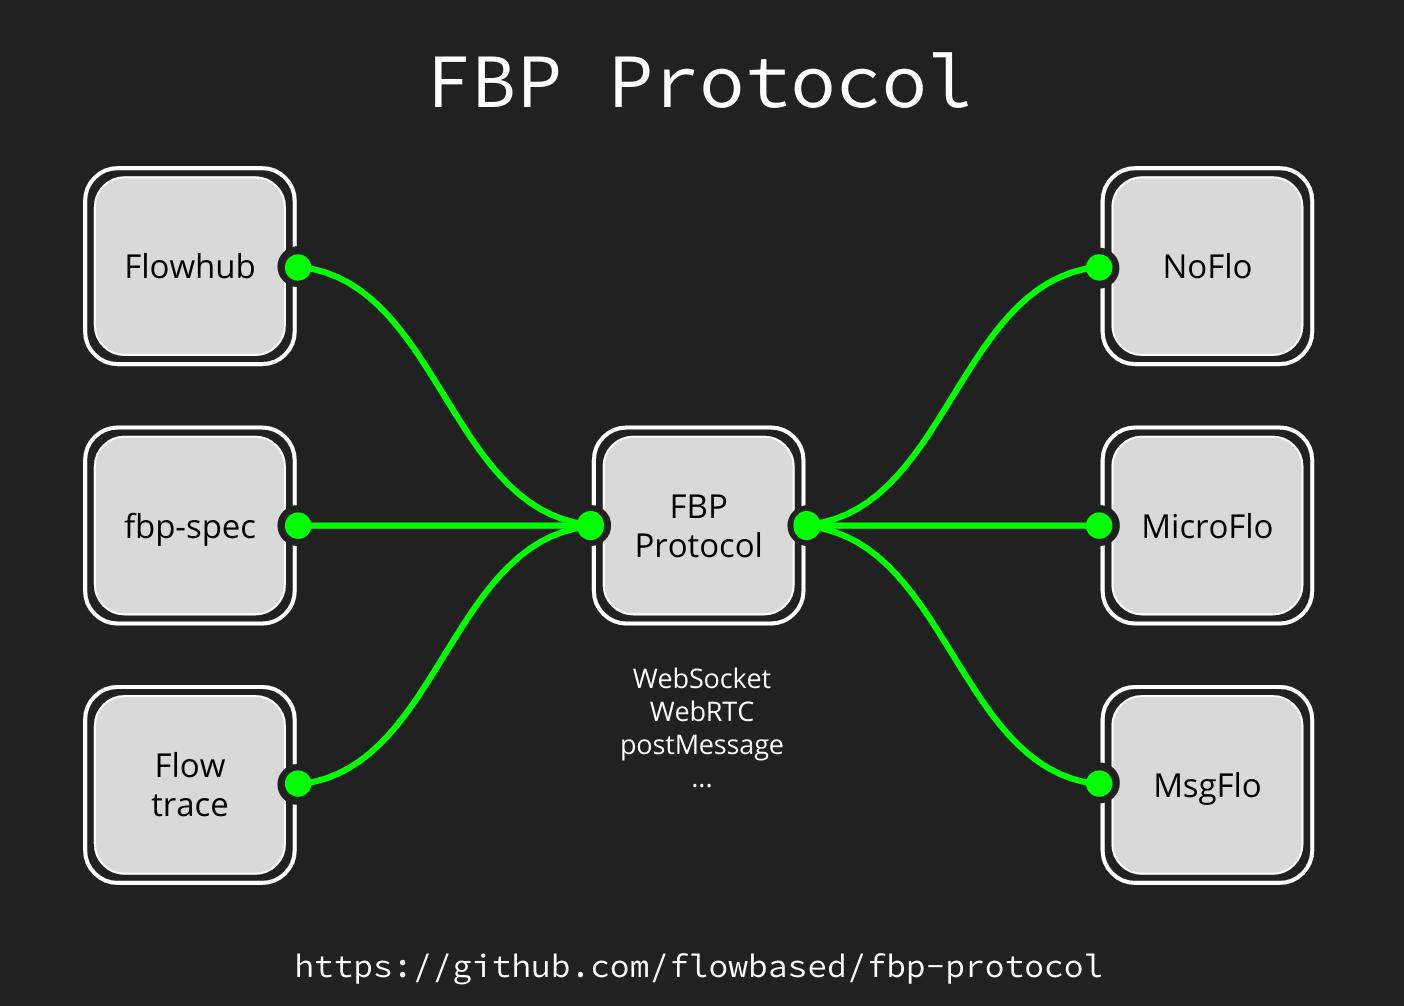 FBP protocol